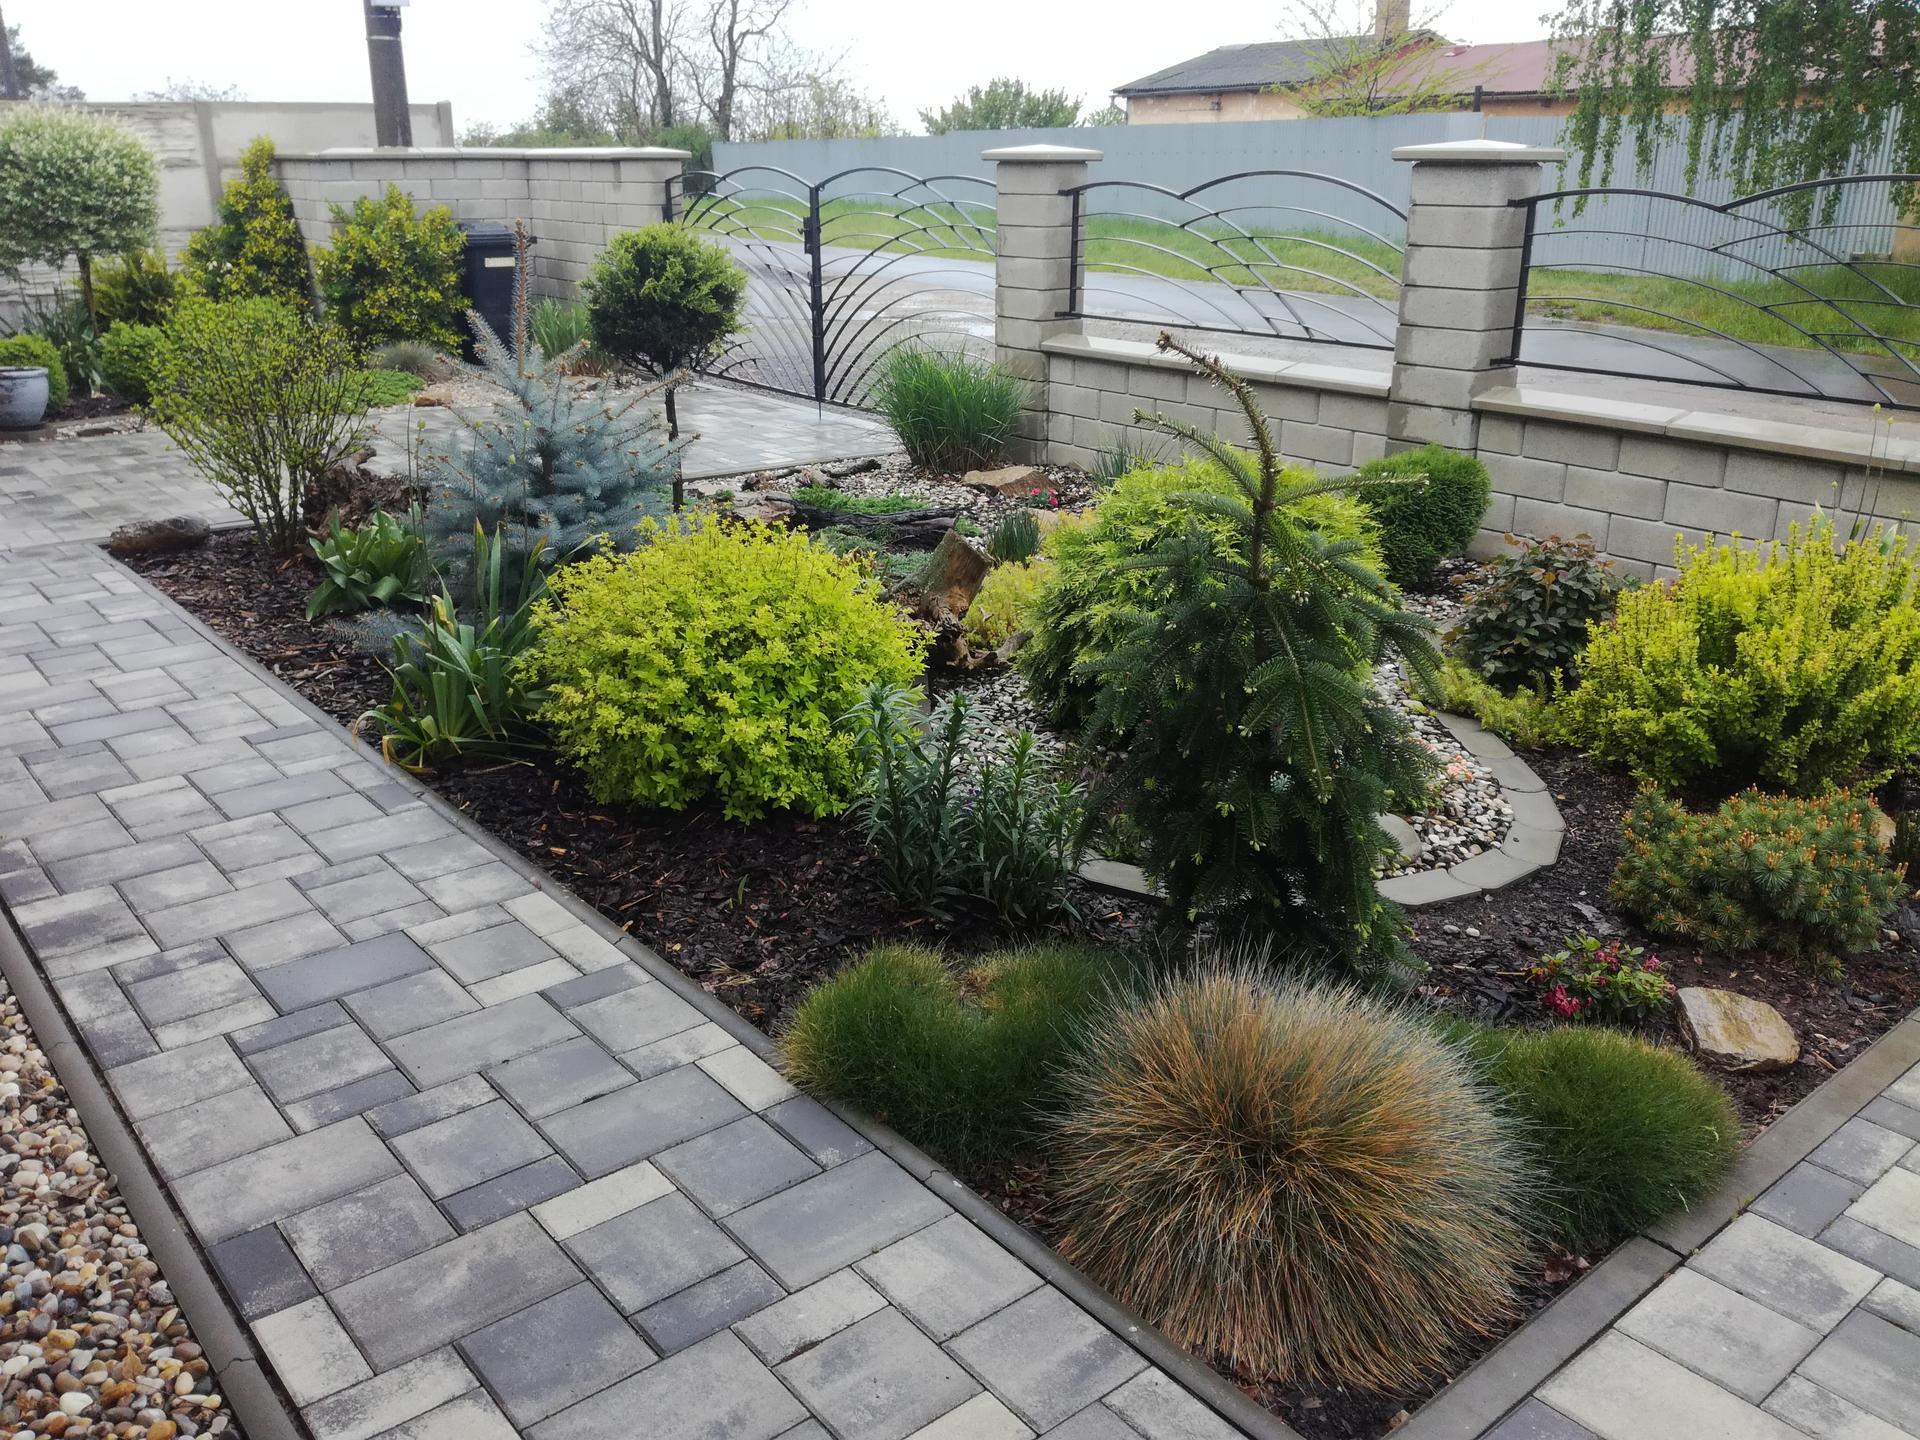 Zahrada 2021 🌲 - Obrázek č. 58